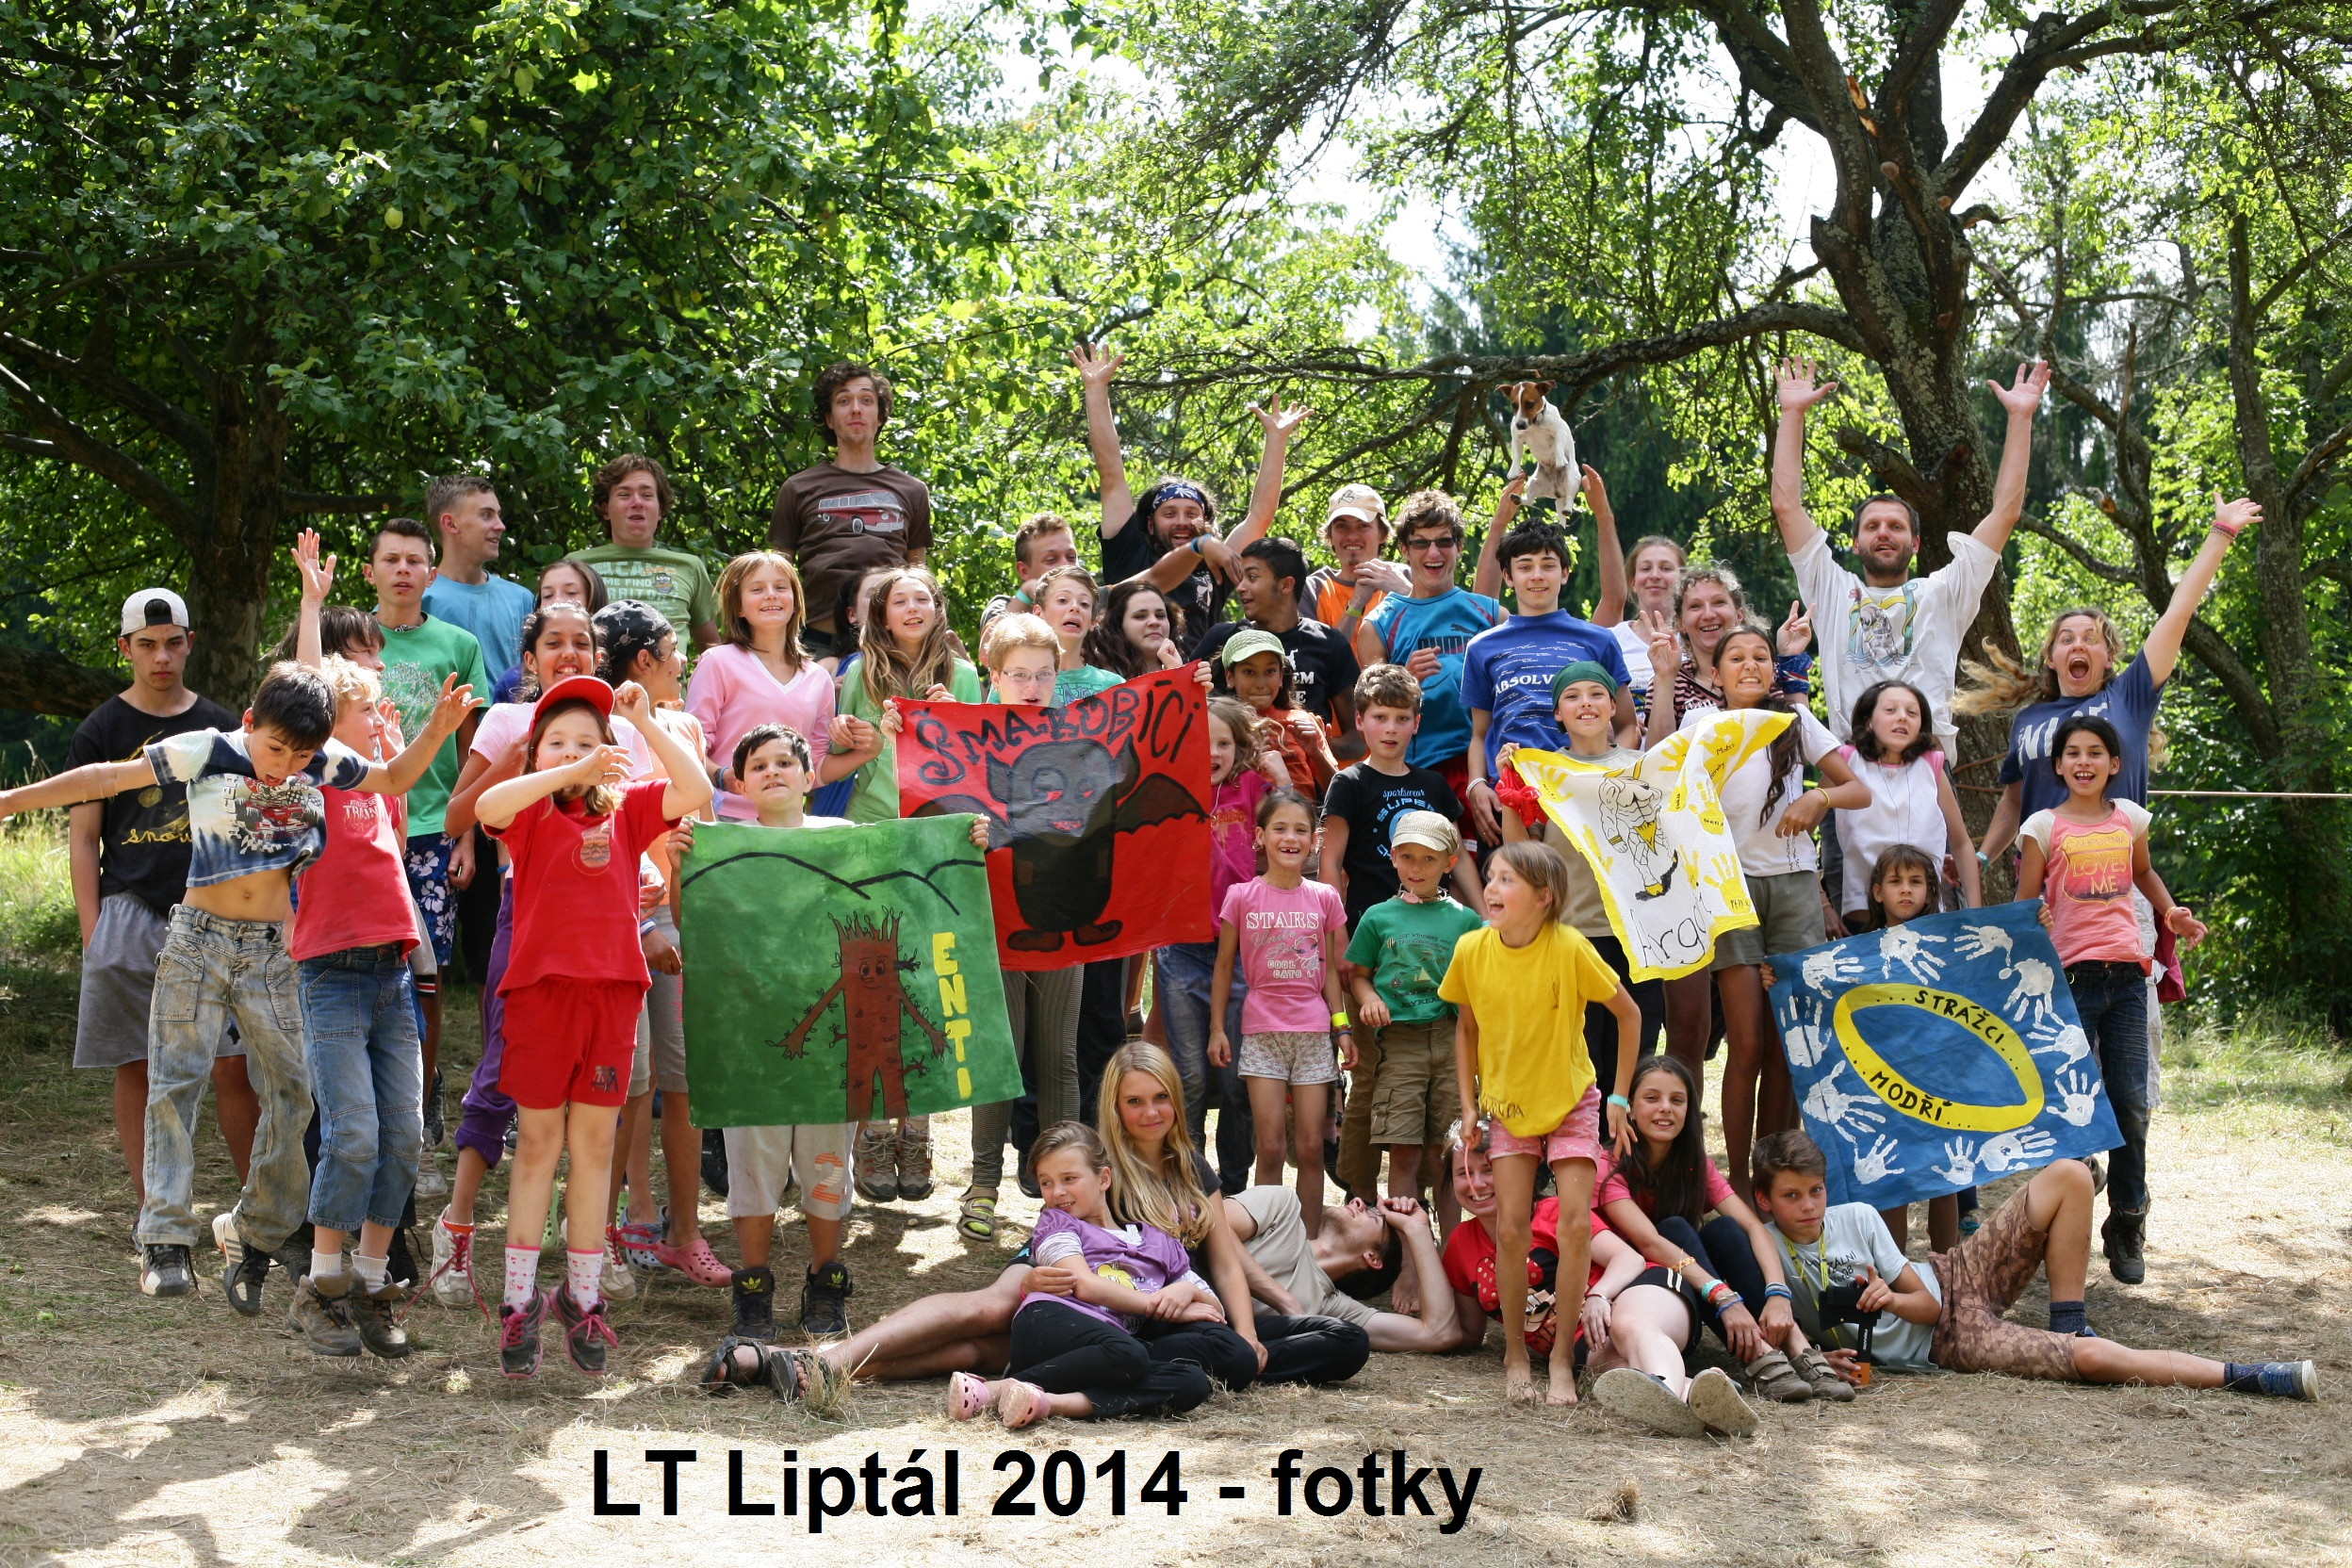 LT LIPTAL 2014 - FOTKY